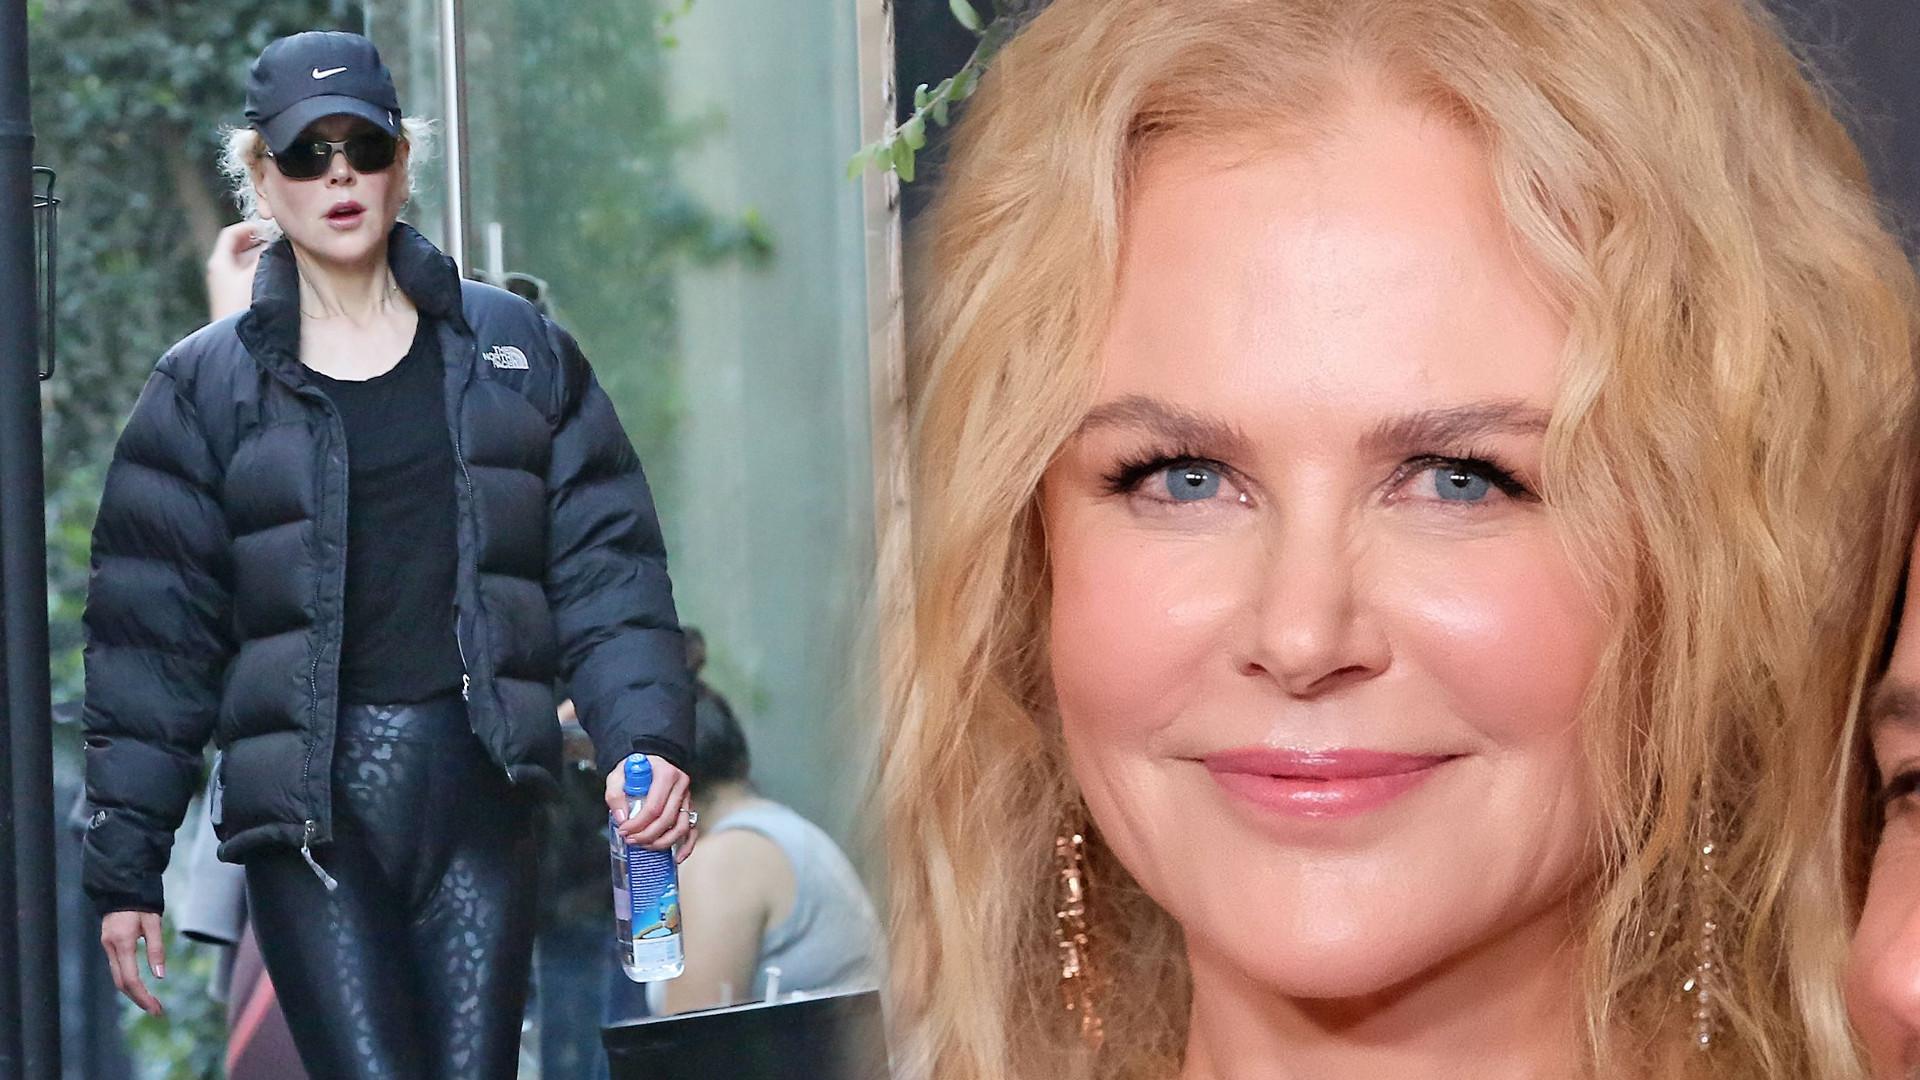 Nicole Kidman ma 52 lata a figurę jak 18-nastka! (FOTO)